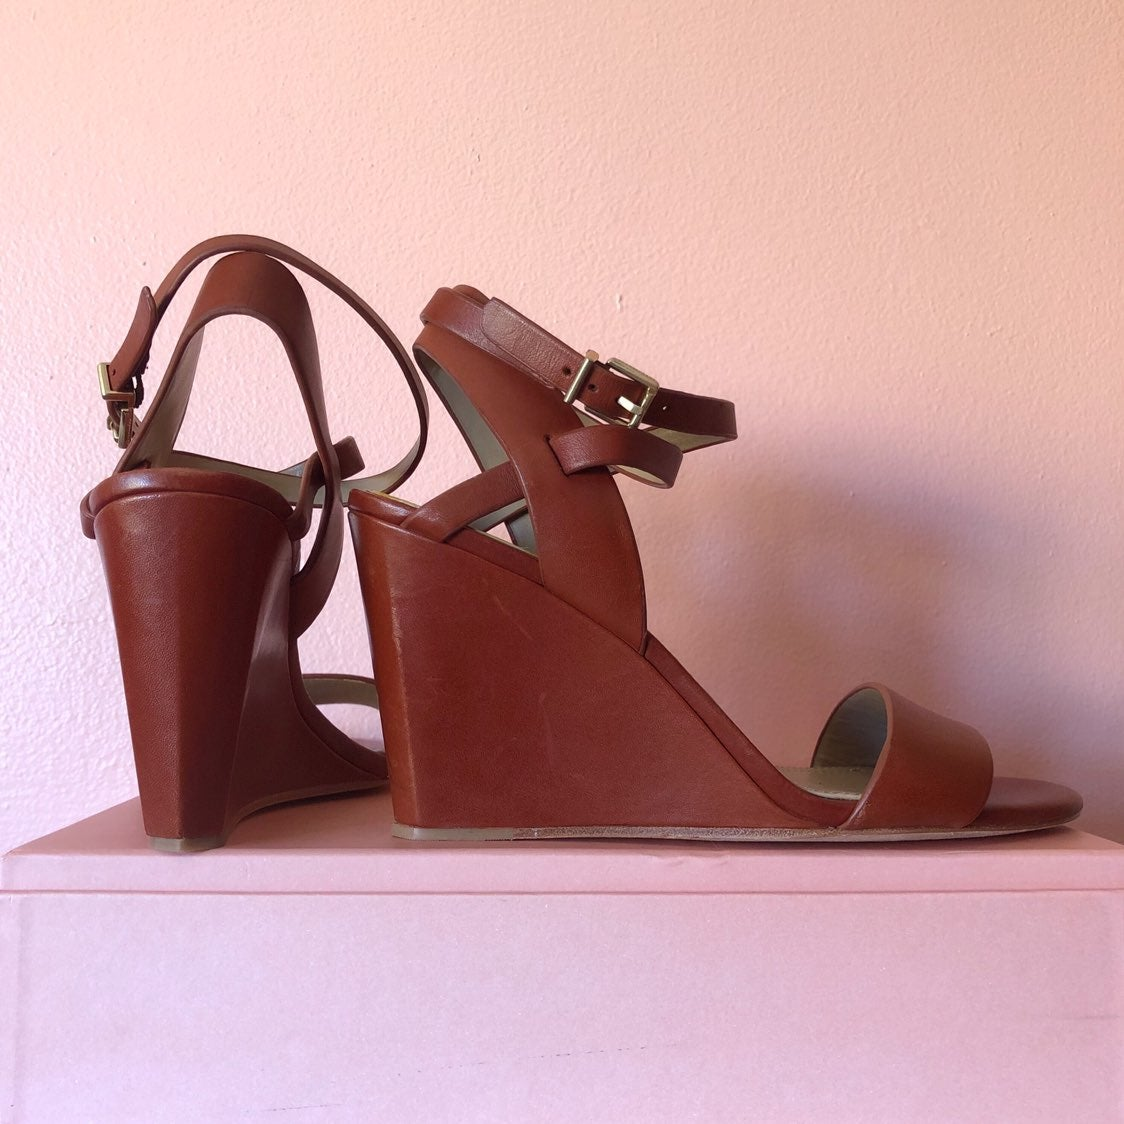 BCBG Max Azria Cinnamon Wedge Sandals